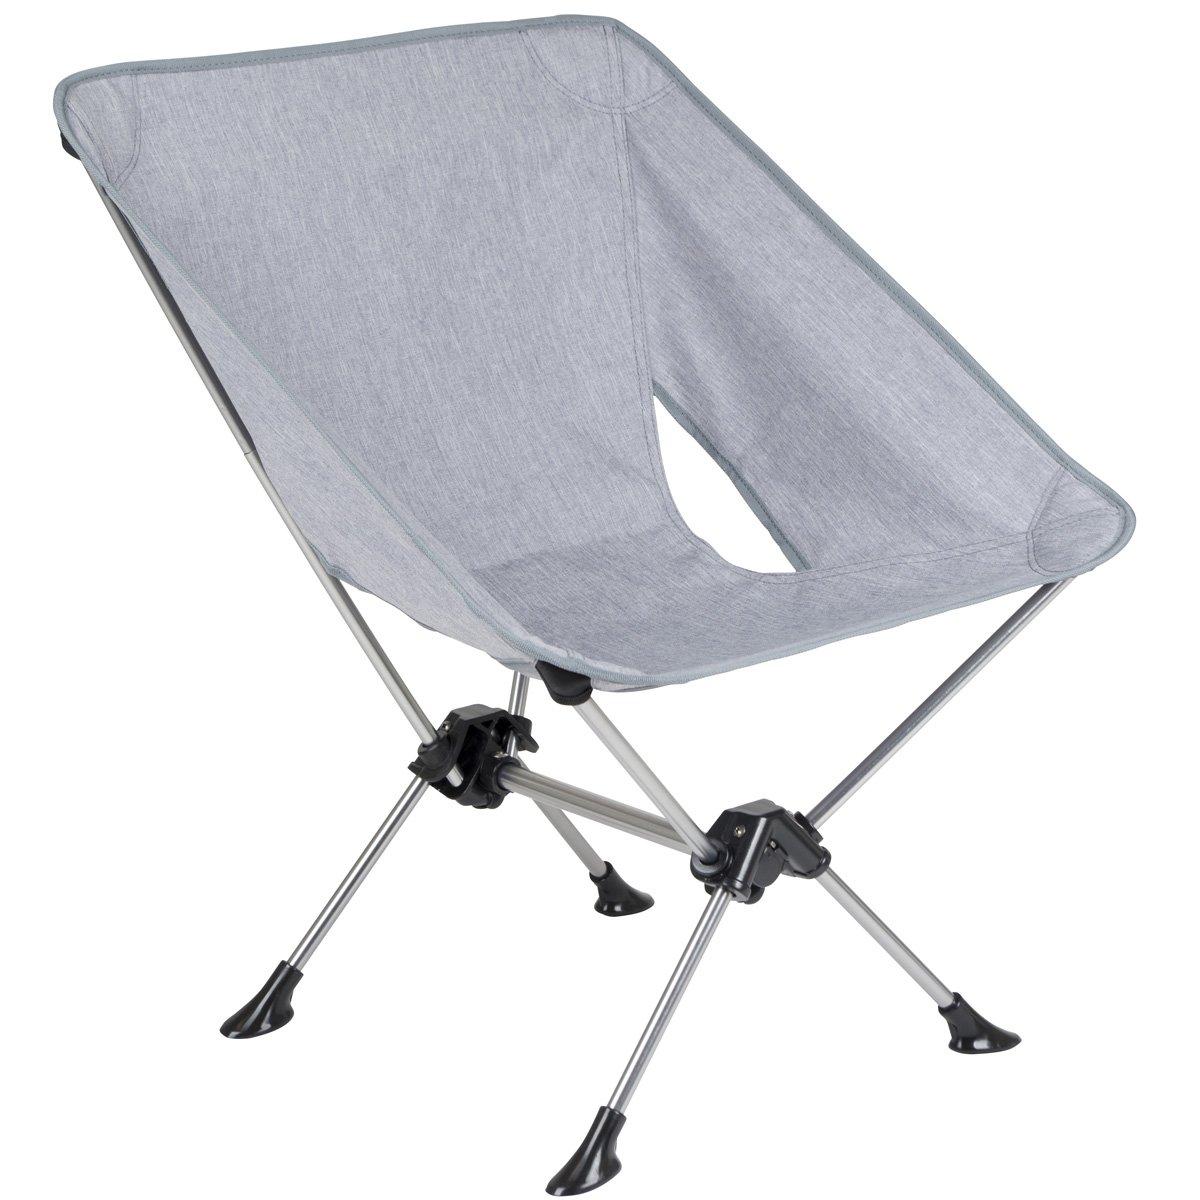 Faltstuhl mit robustem Aluminiumgestell und hochwertigem Polyesterbezug • Camping Stuhl Klappsessel Campingstuhl Klappstuhl Sessel Angelstuhl